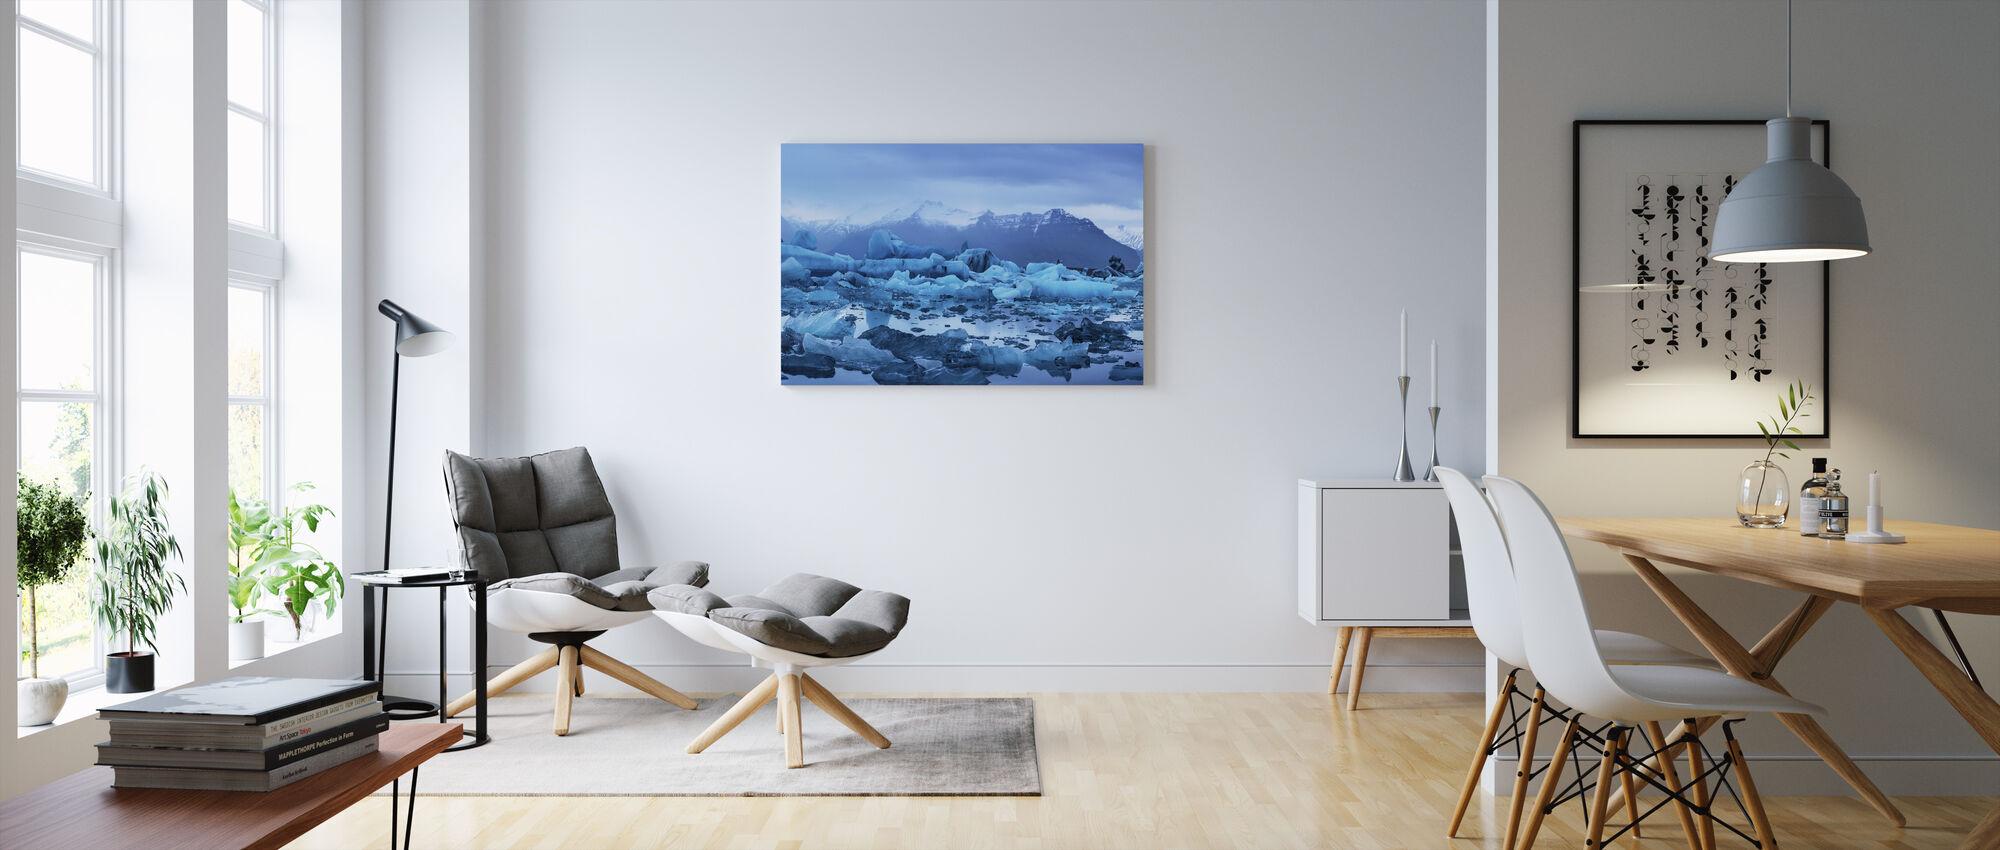 Ljus från Island - Canvastavla - Vardagsrum